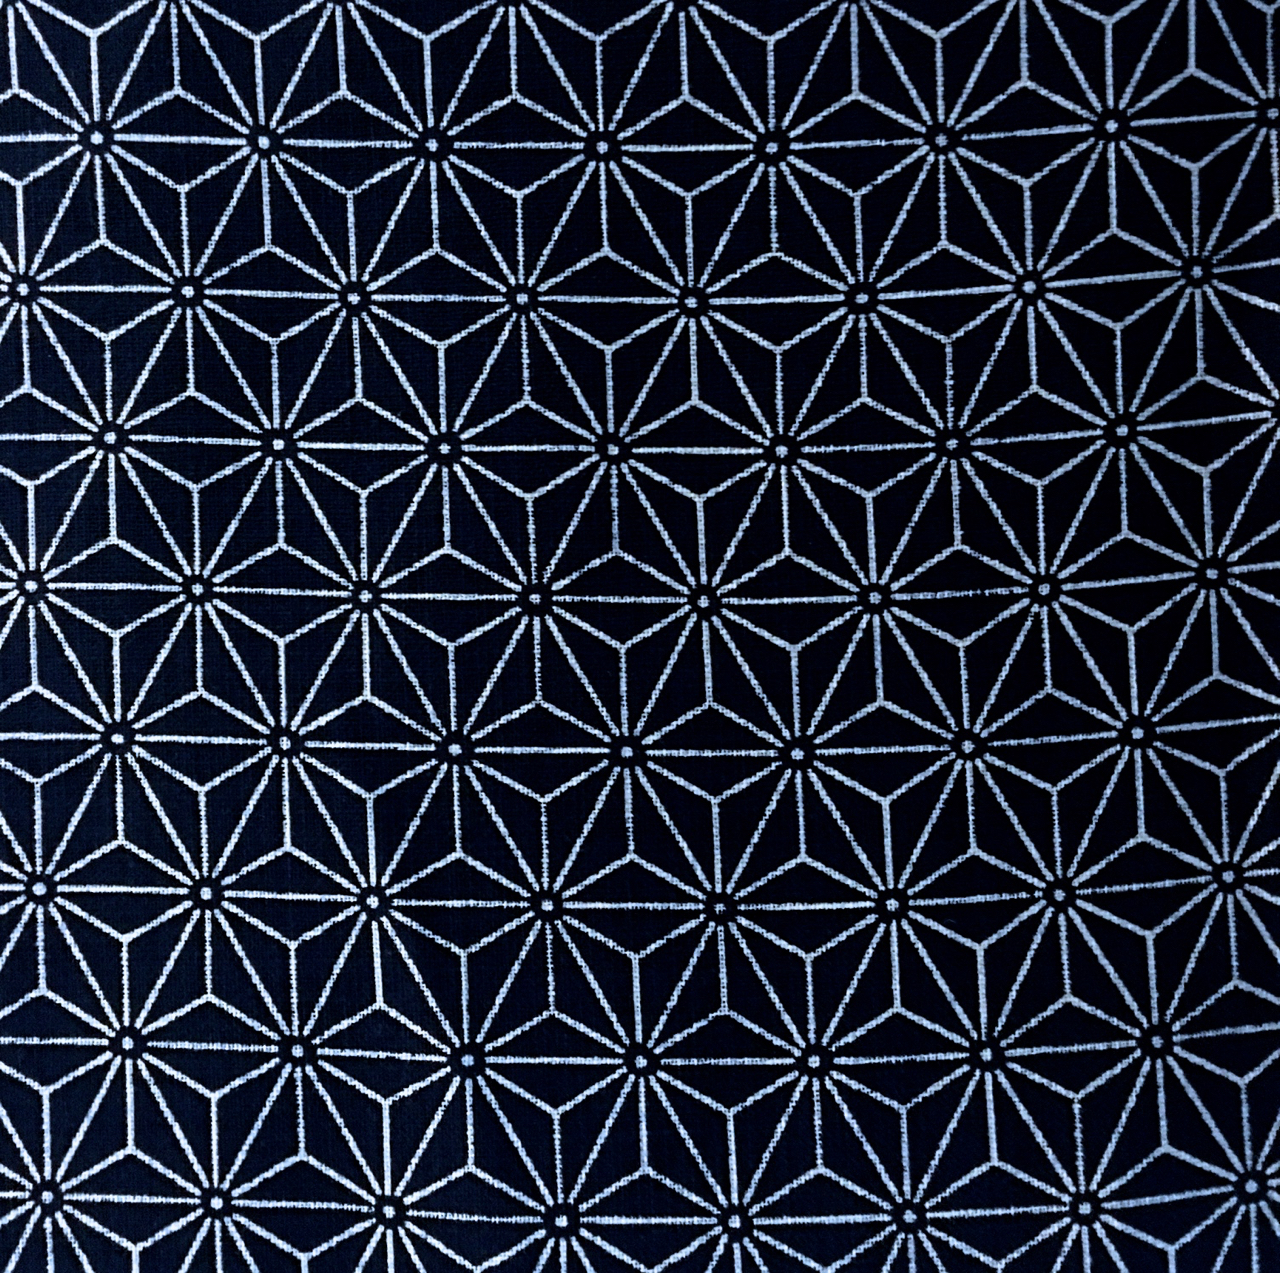 indigo fabric with asanoha design